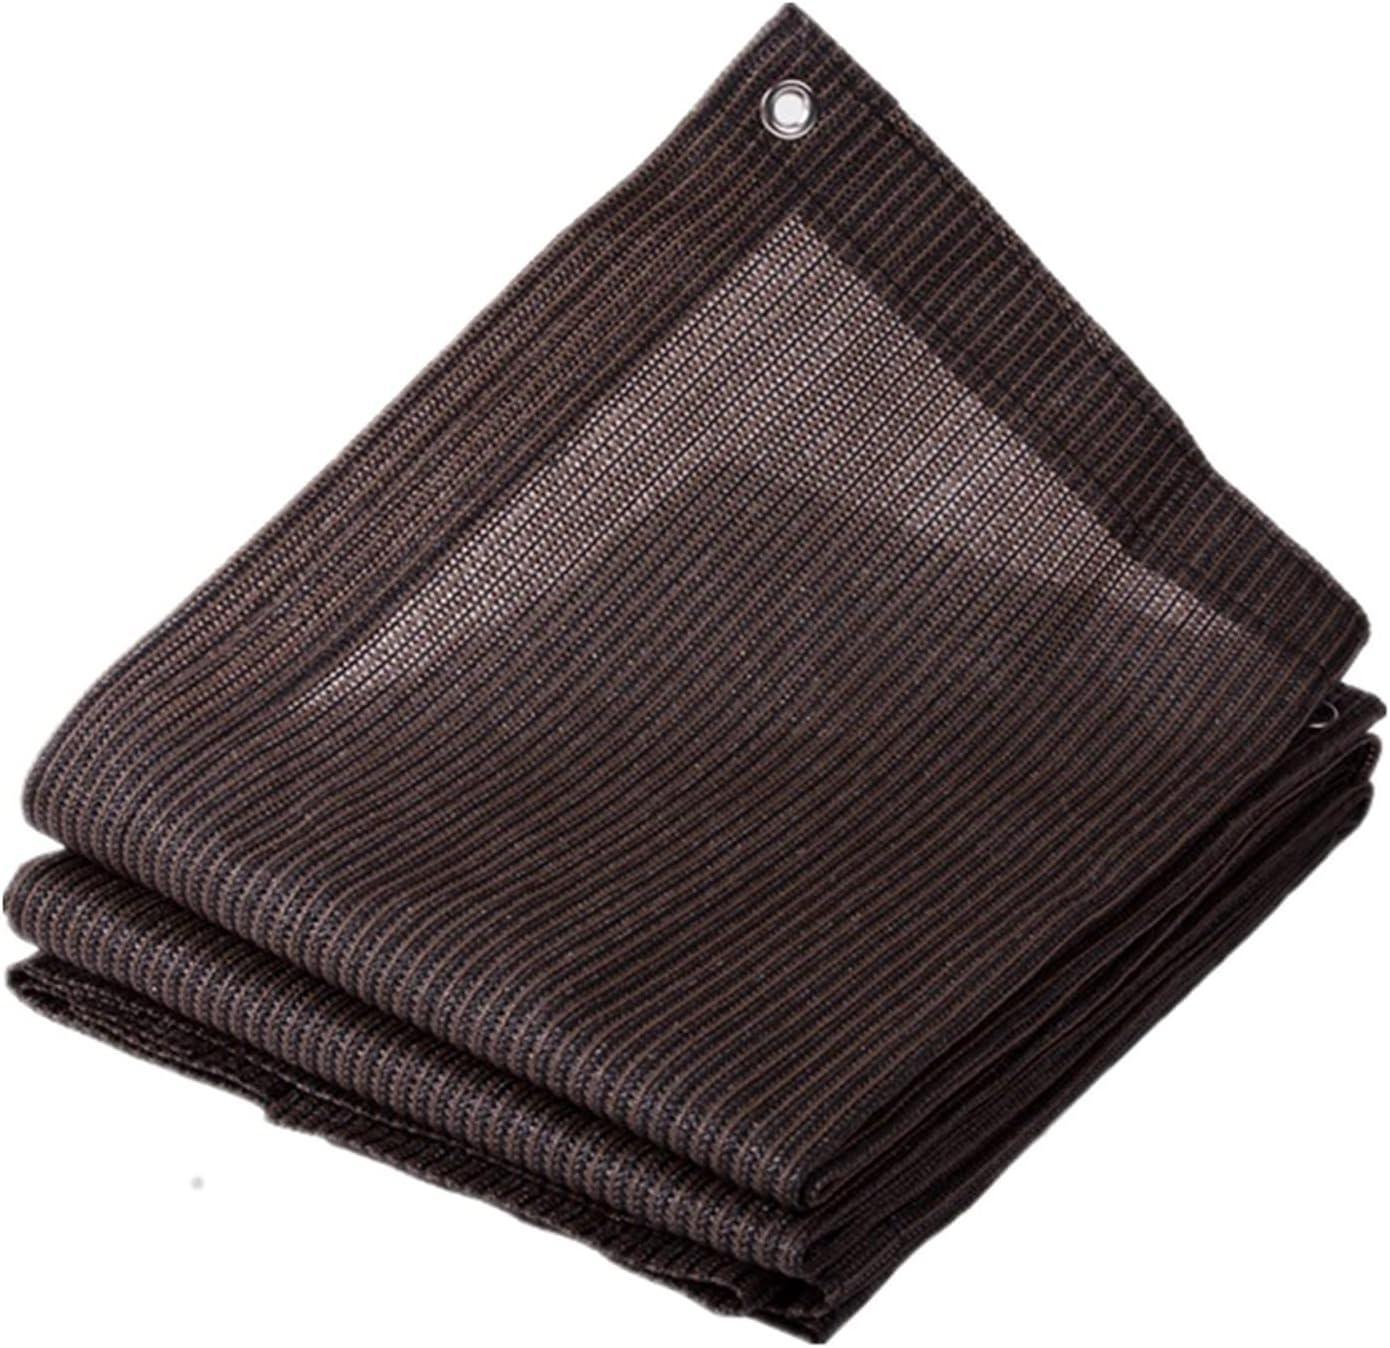 WLLYP Sunshade Low price Net Outdoor Garden Sunblock Cloth Shade Sunscreen Cheap mail order shopping